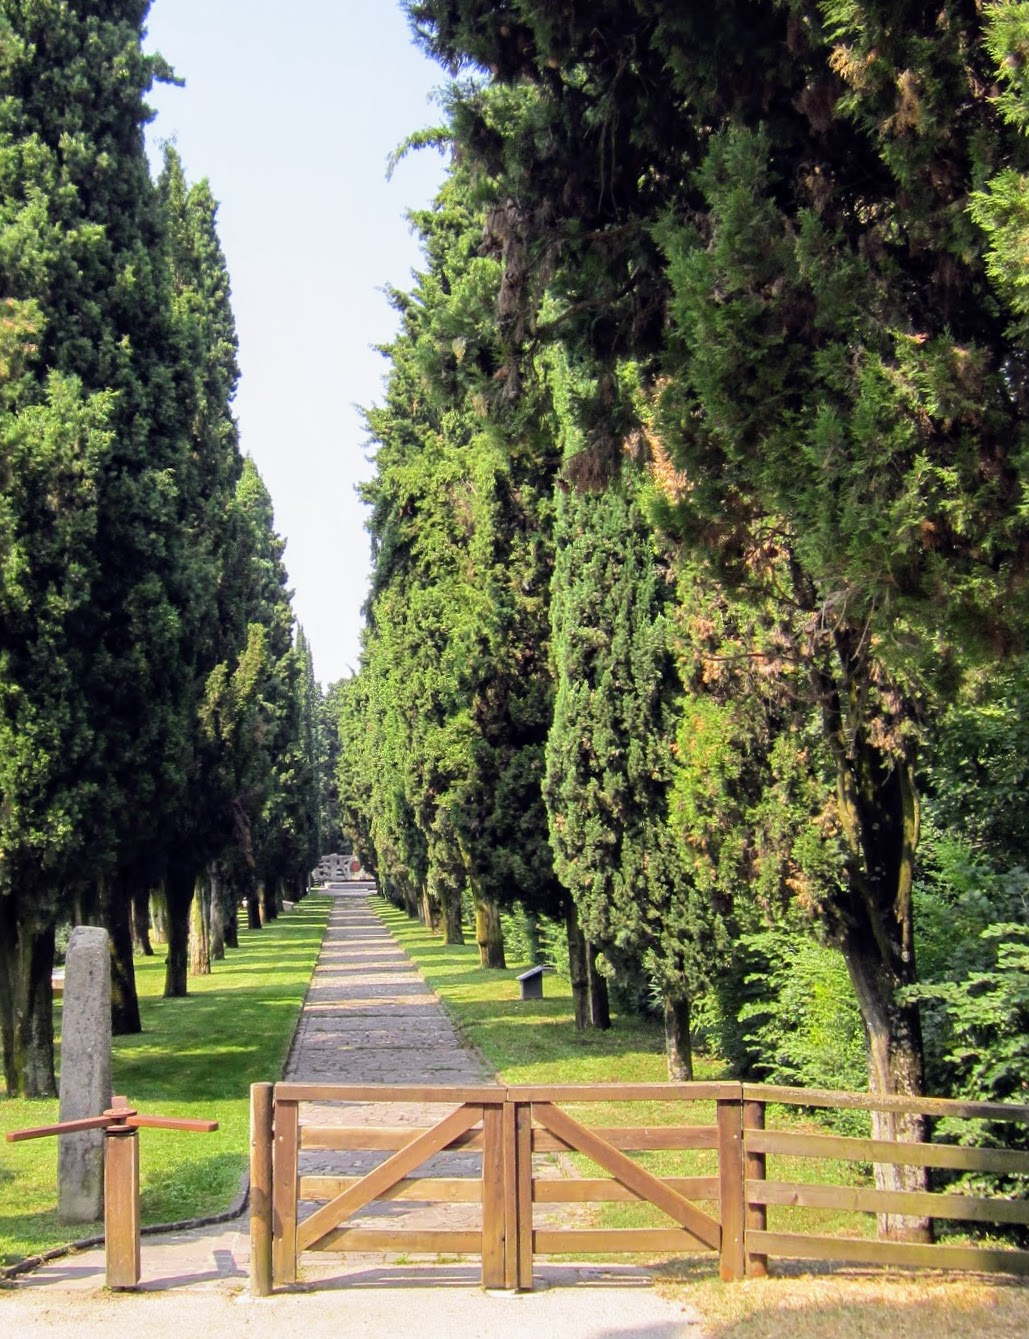 Wandelpad naar monument Rode Kruis Solferino